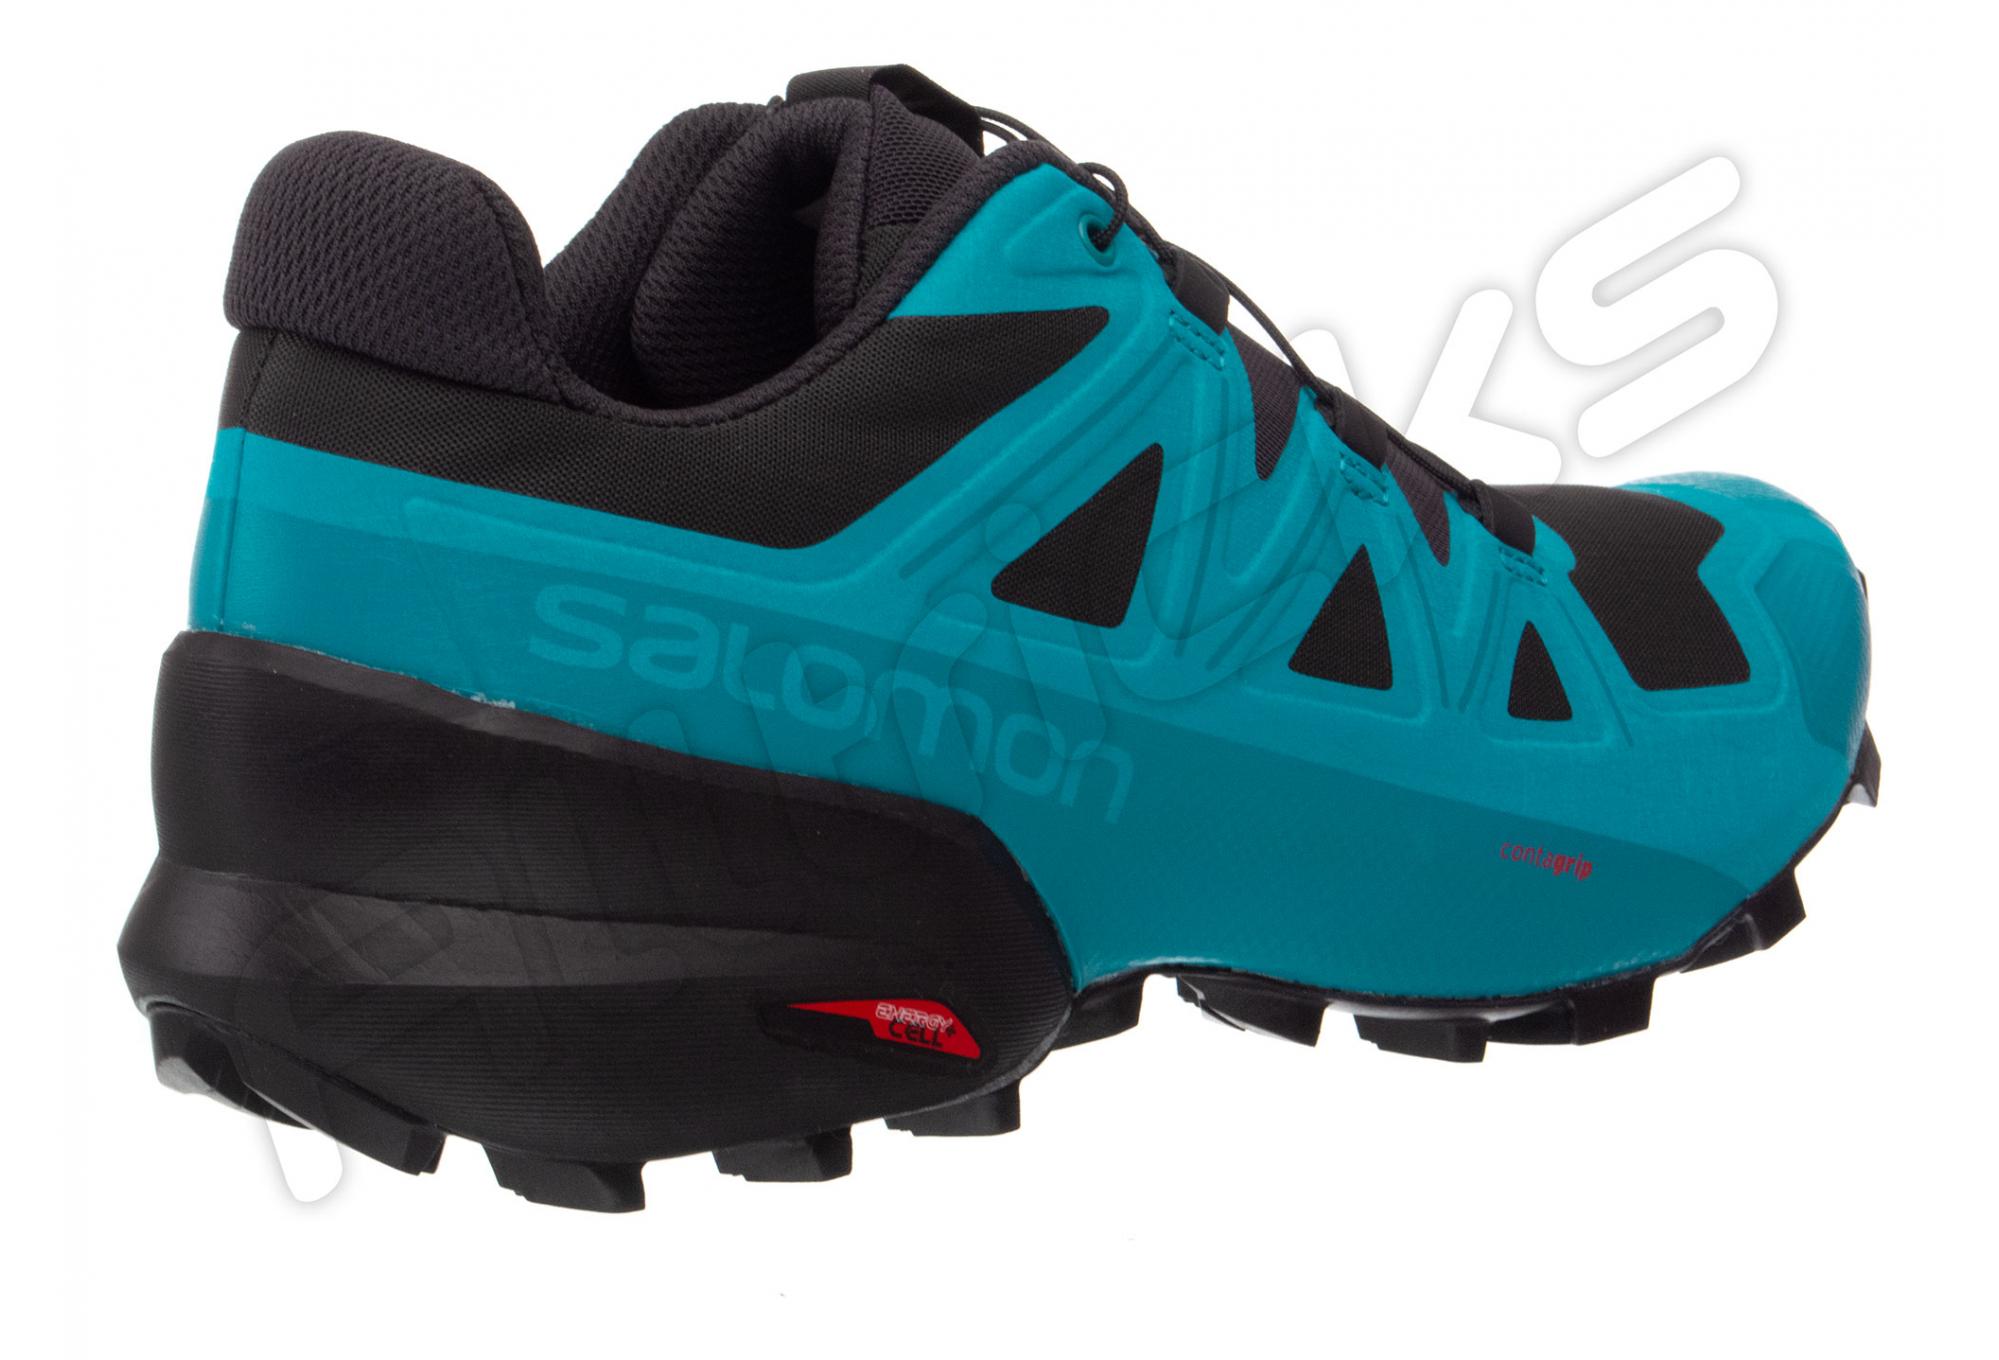 Salomon Speedcross 5 Shoes Bleu